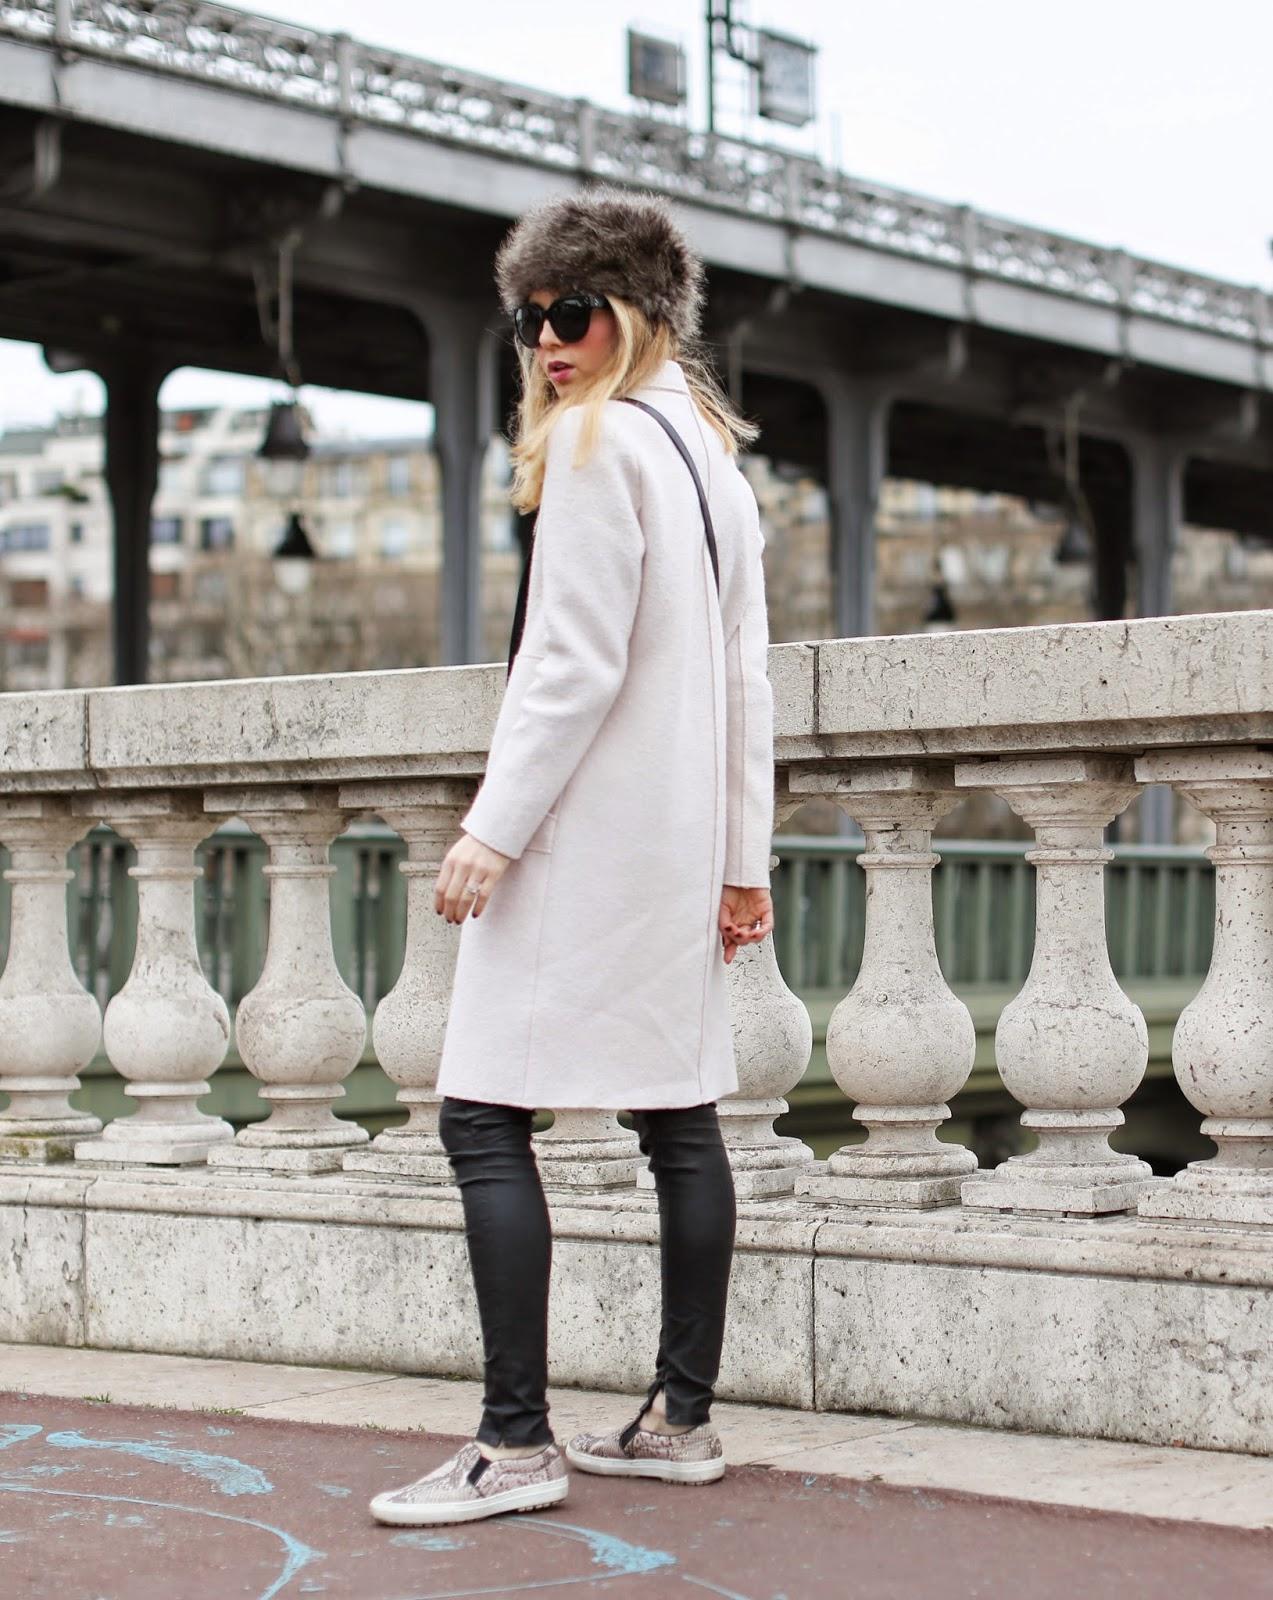 zara, céline pale pink, python slipons, blk dnm, fur hat, eiffel tower, streetstyle paris, fashion blogger